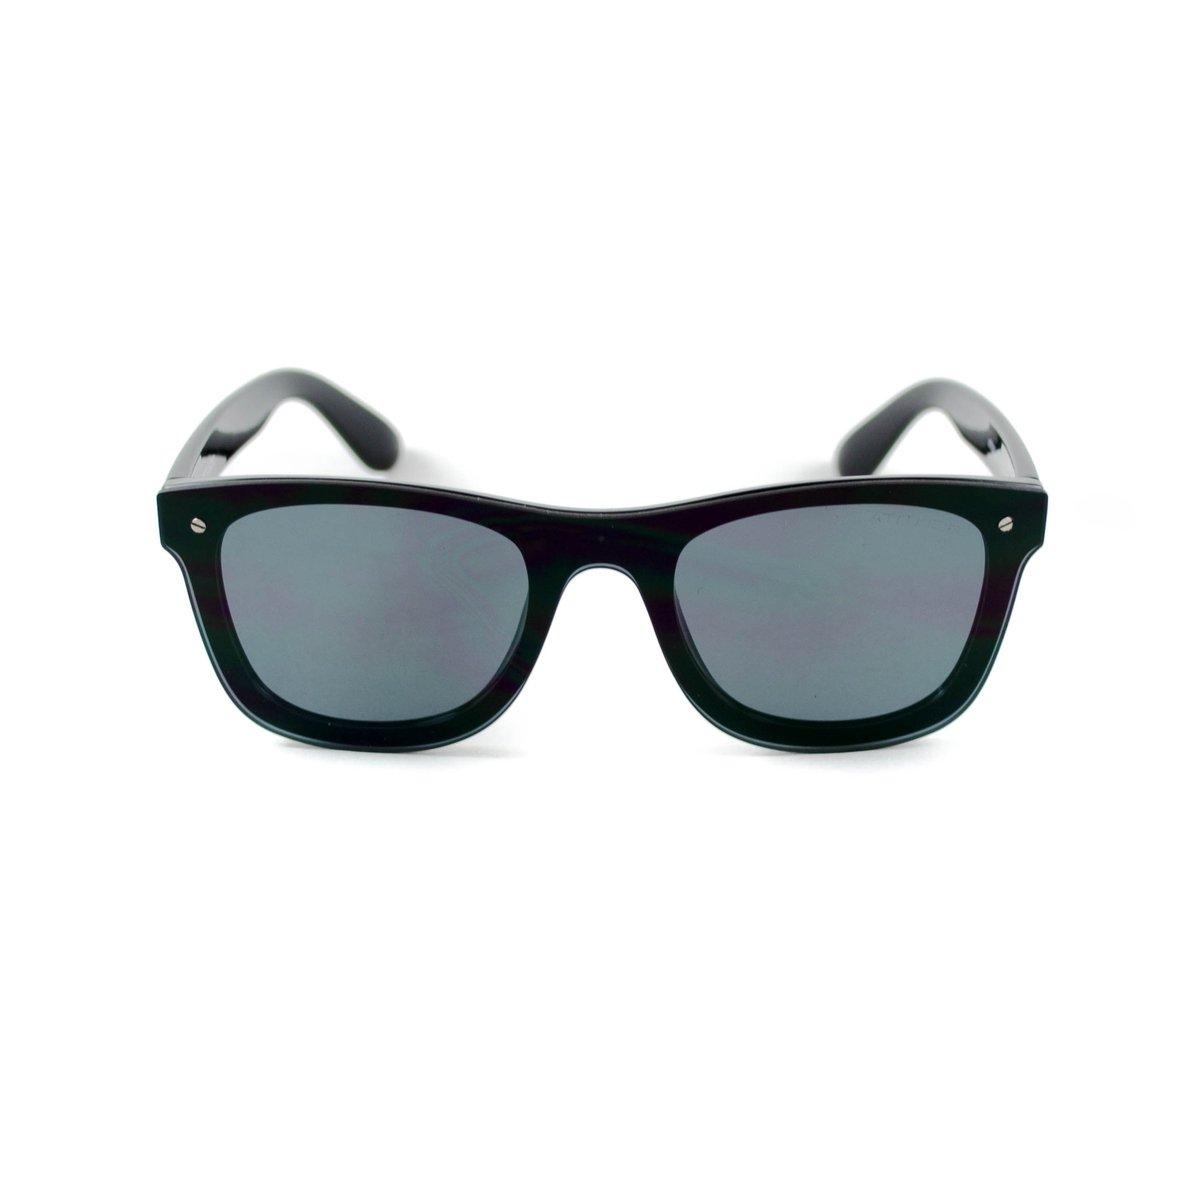 Óculos Atitude - AT5333 A01 - Compre Agora   Netshoes 3936eda50e